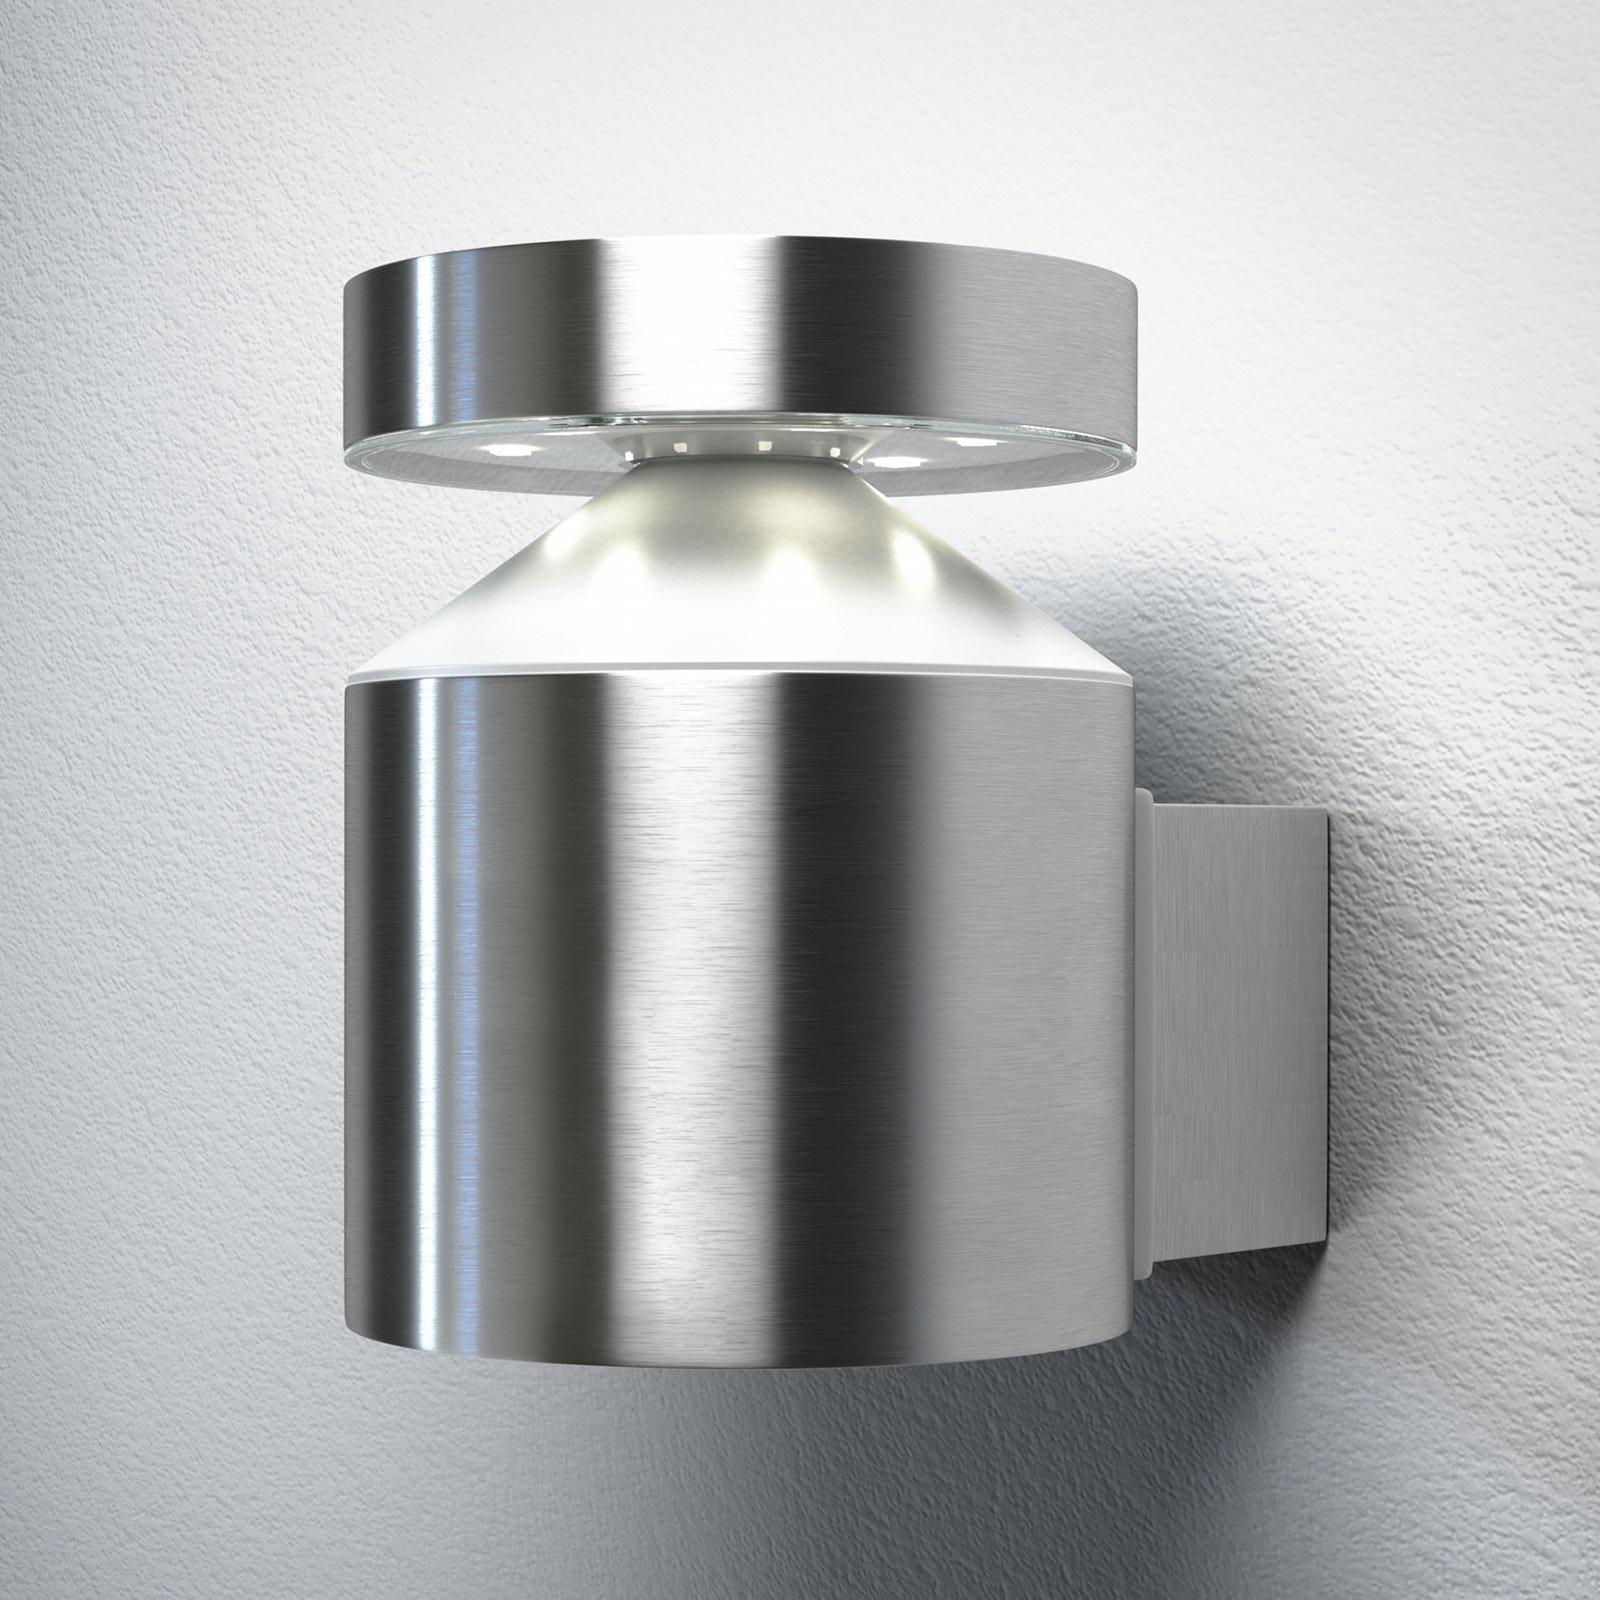 LEDVANCE Endura Style Cylinder utendørs vegglampe